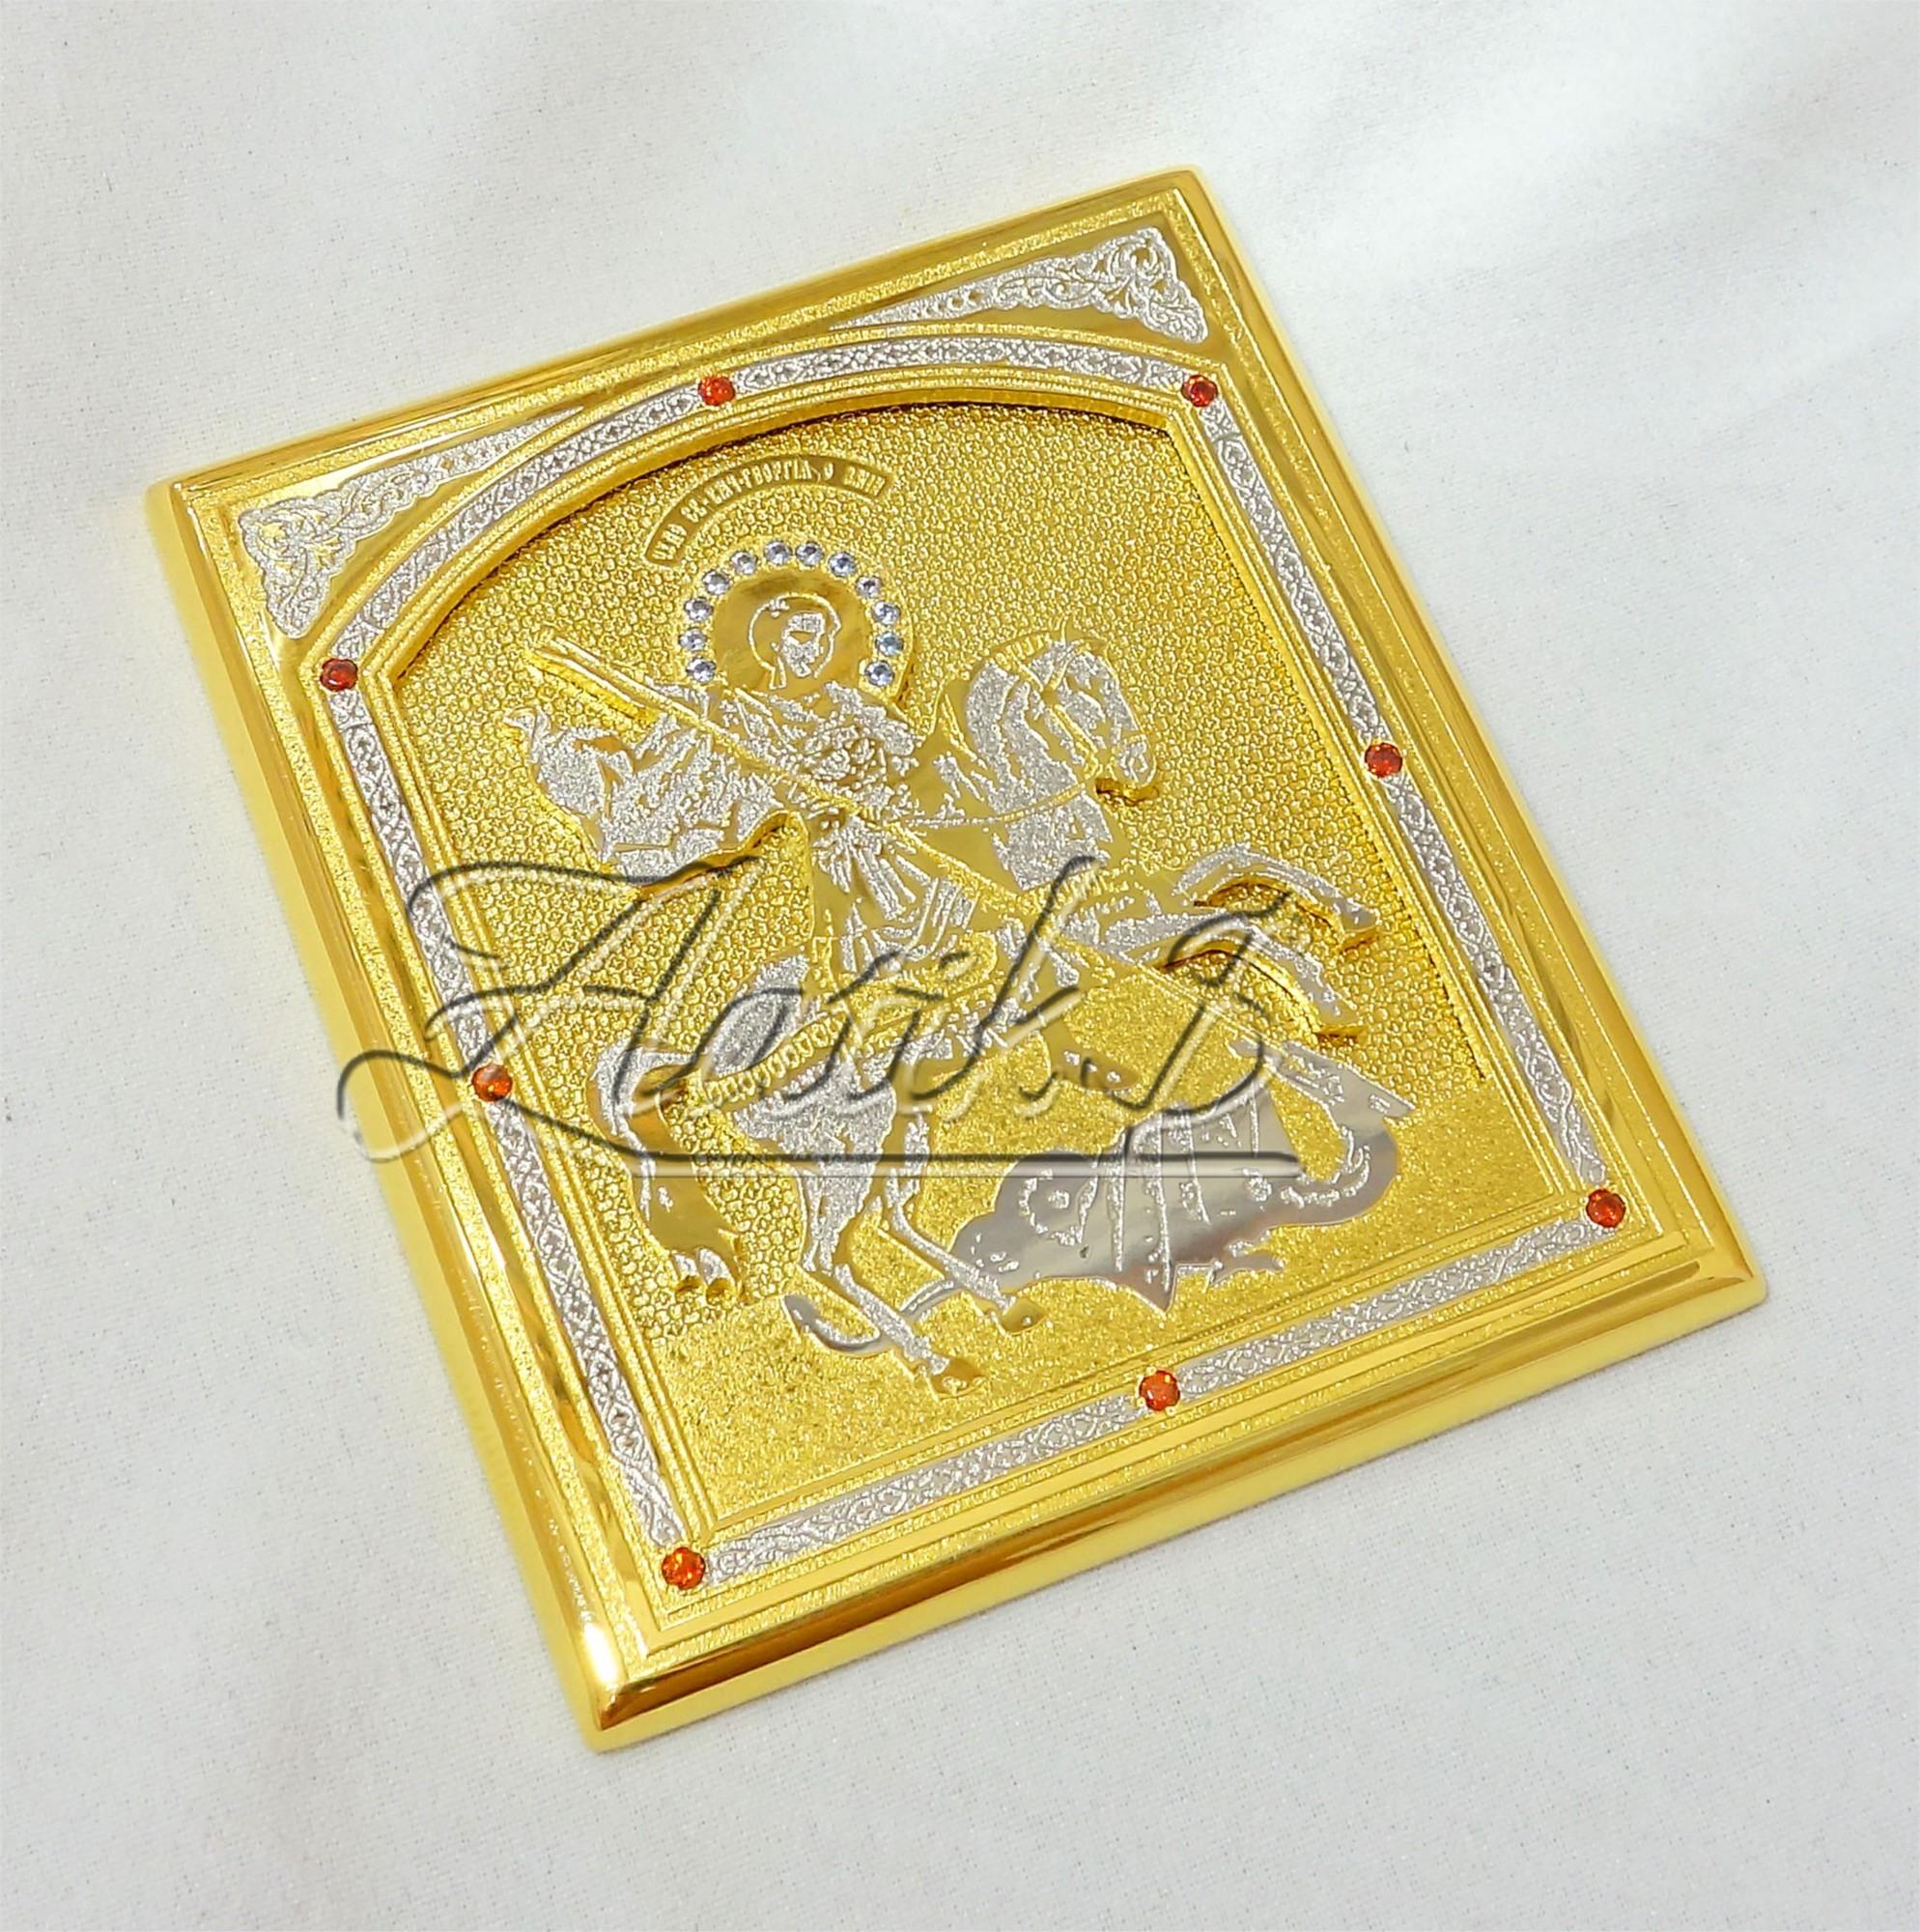 Карманная икона Георгия Победоносца